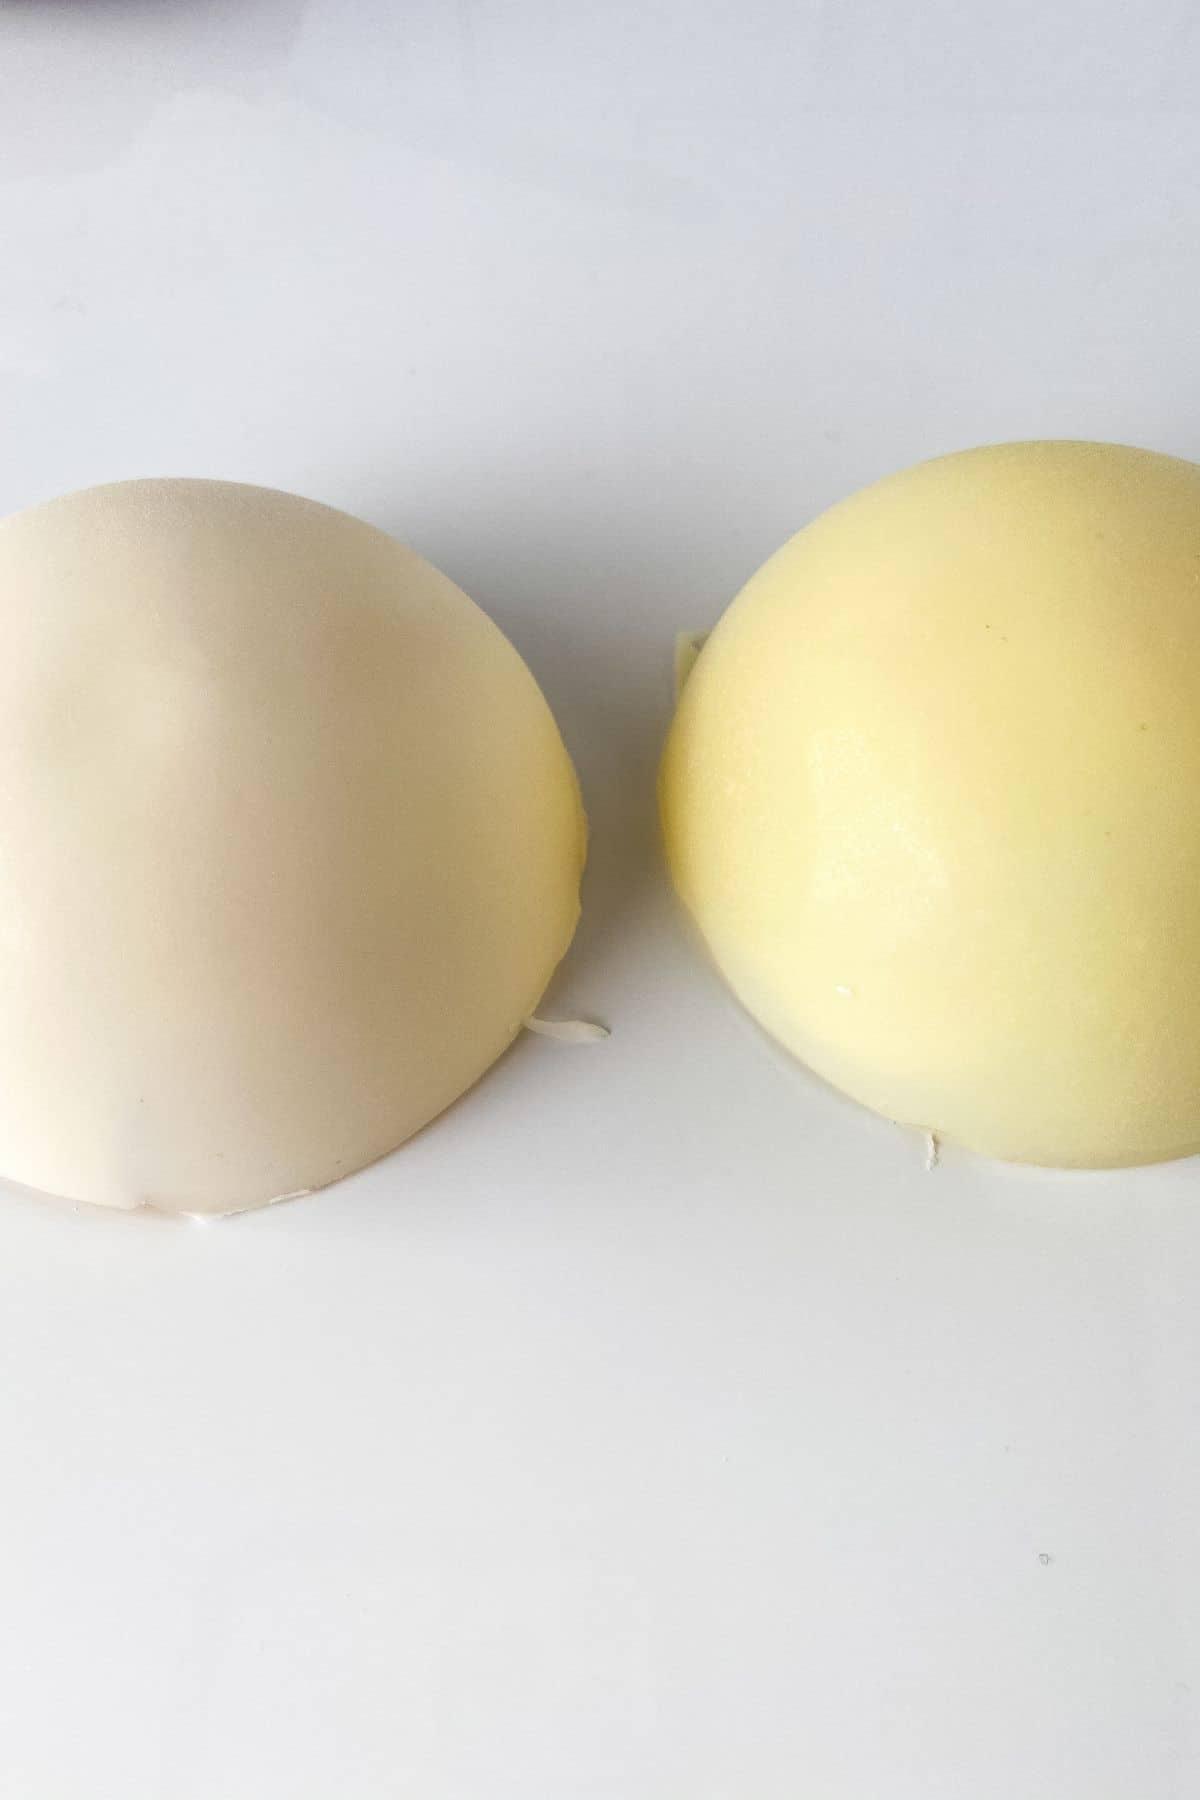 Two white chocolate halves